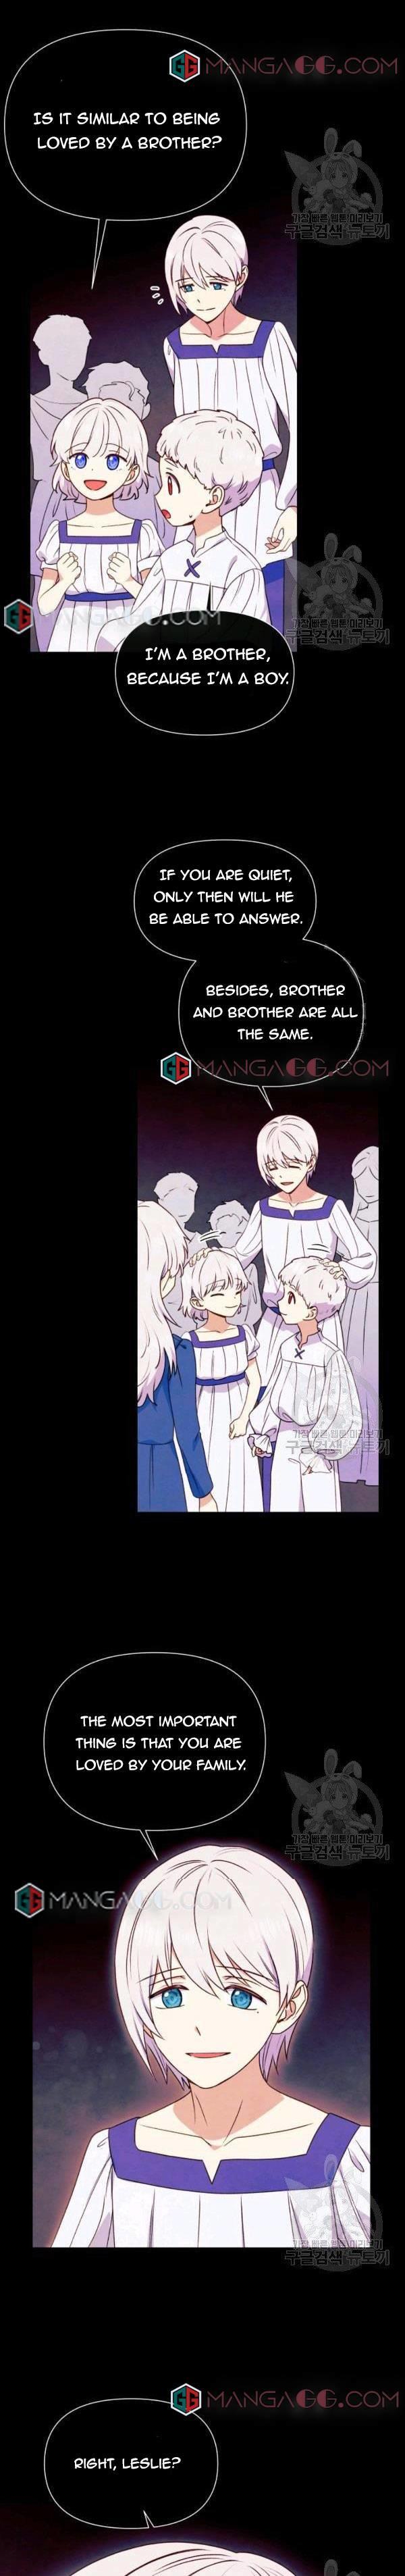 The Monster Duchess And Contract Princess Chapter 121 page 6 - Mangakakalot